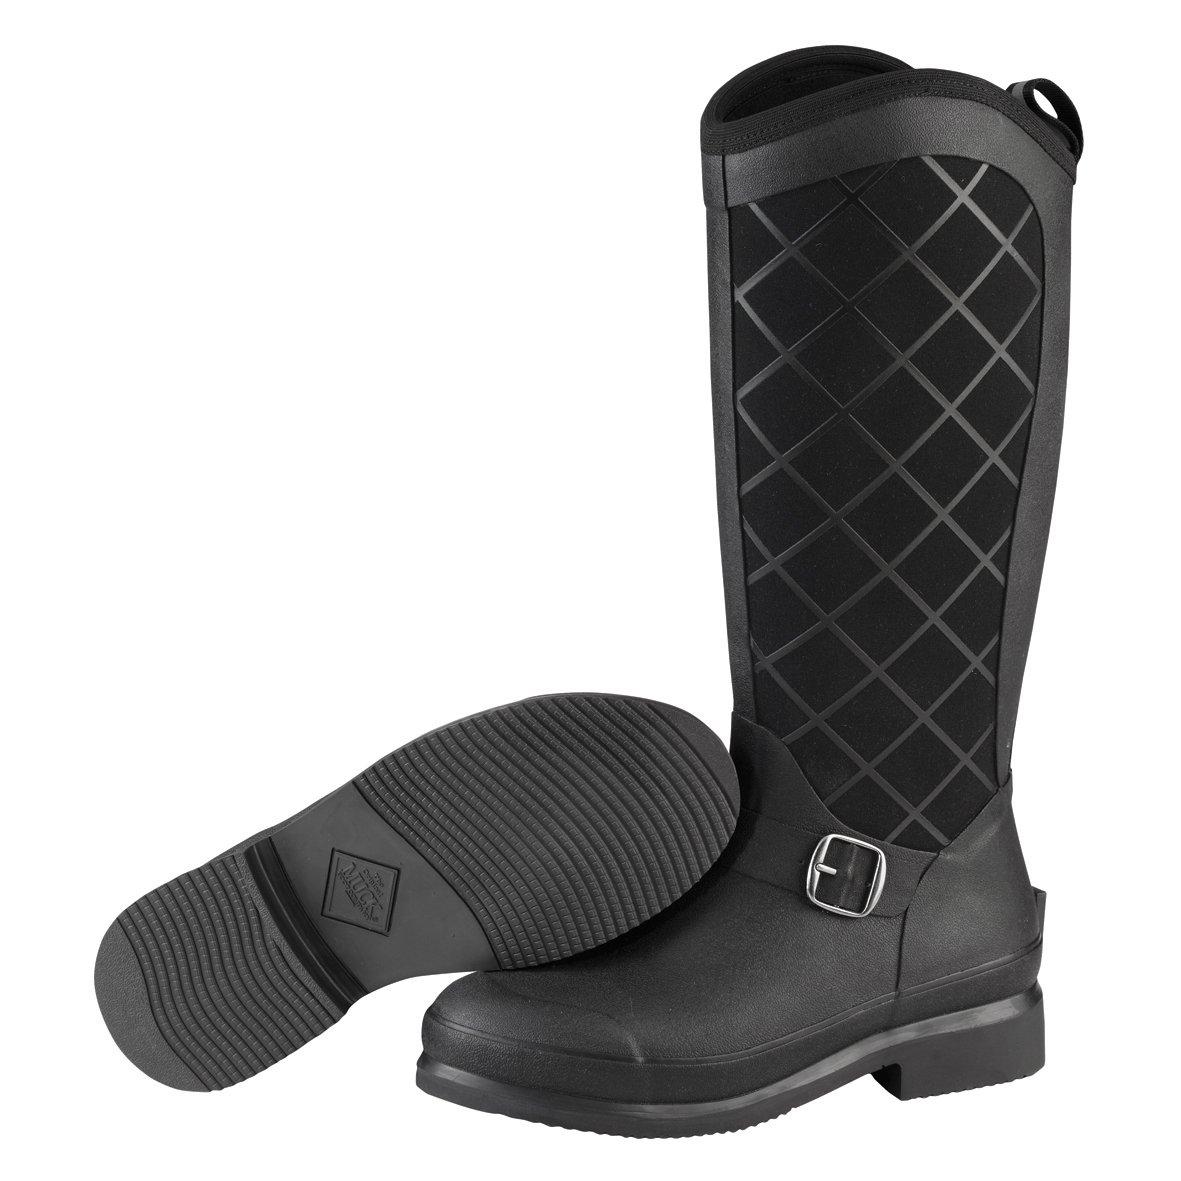 MuckBoots Women's Pacy II Snow Boot,Black,9 M US